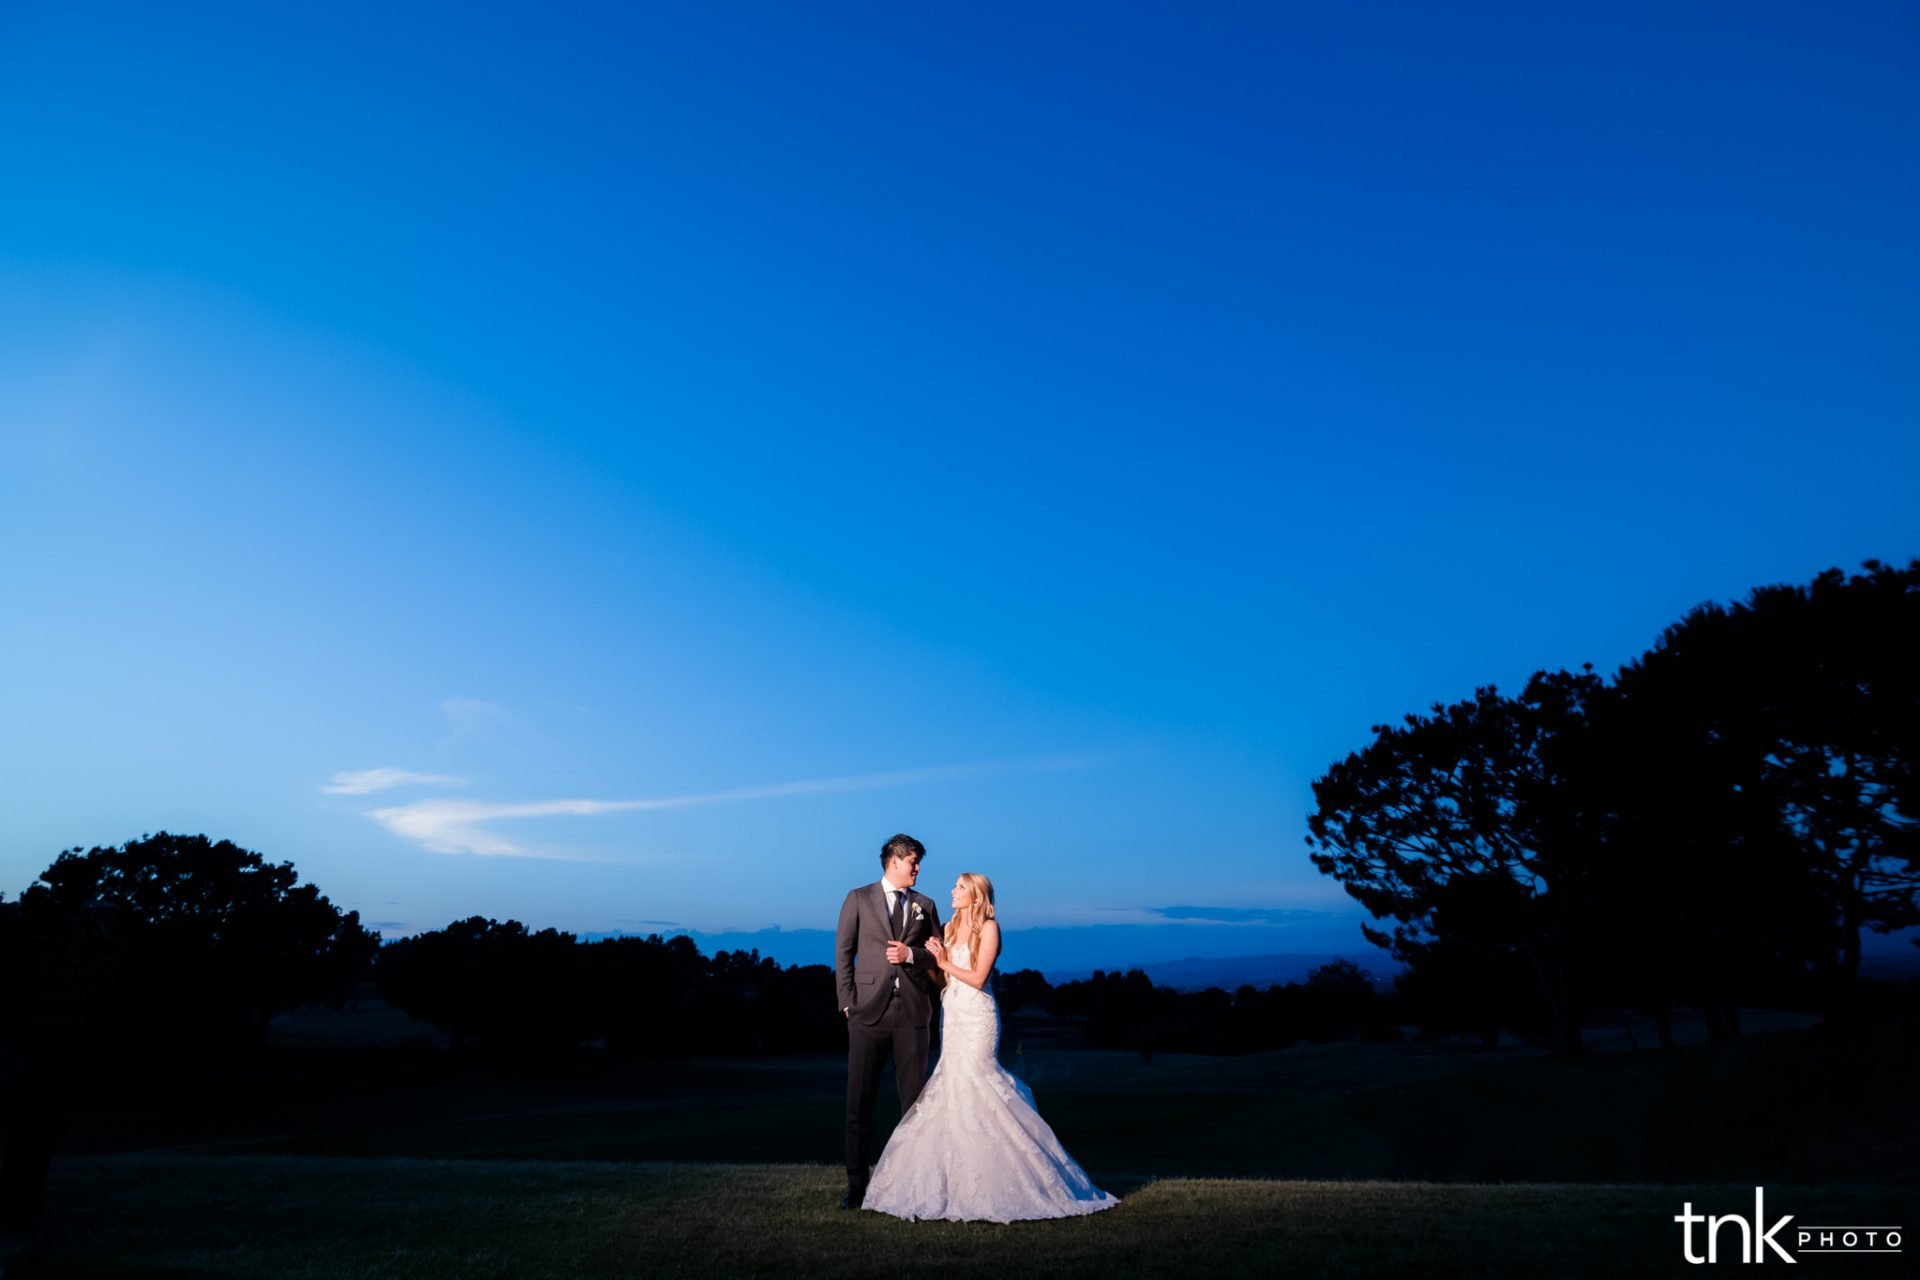 Wedgewood Aliso Viejo Wedding | Shauna and Joshua